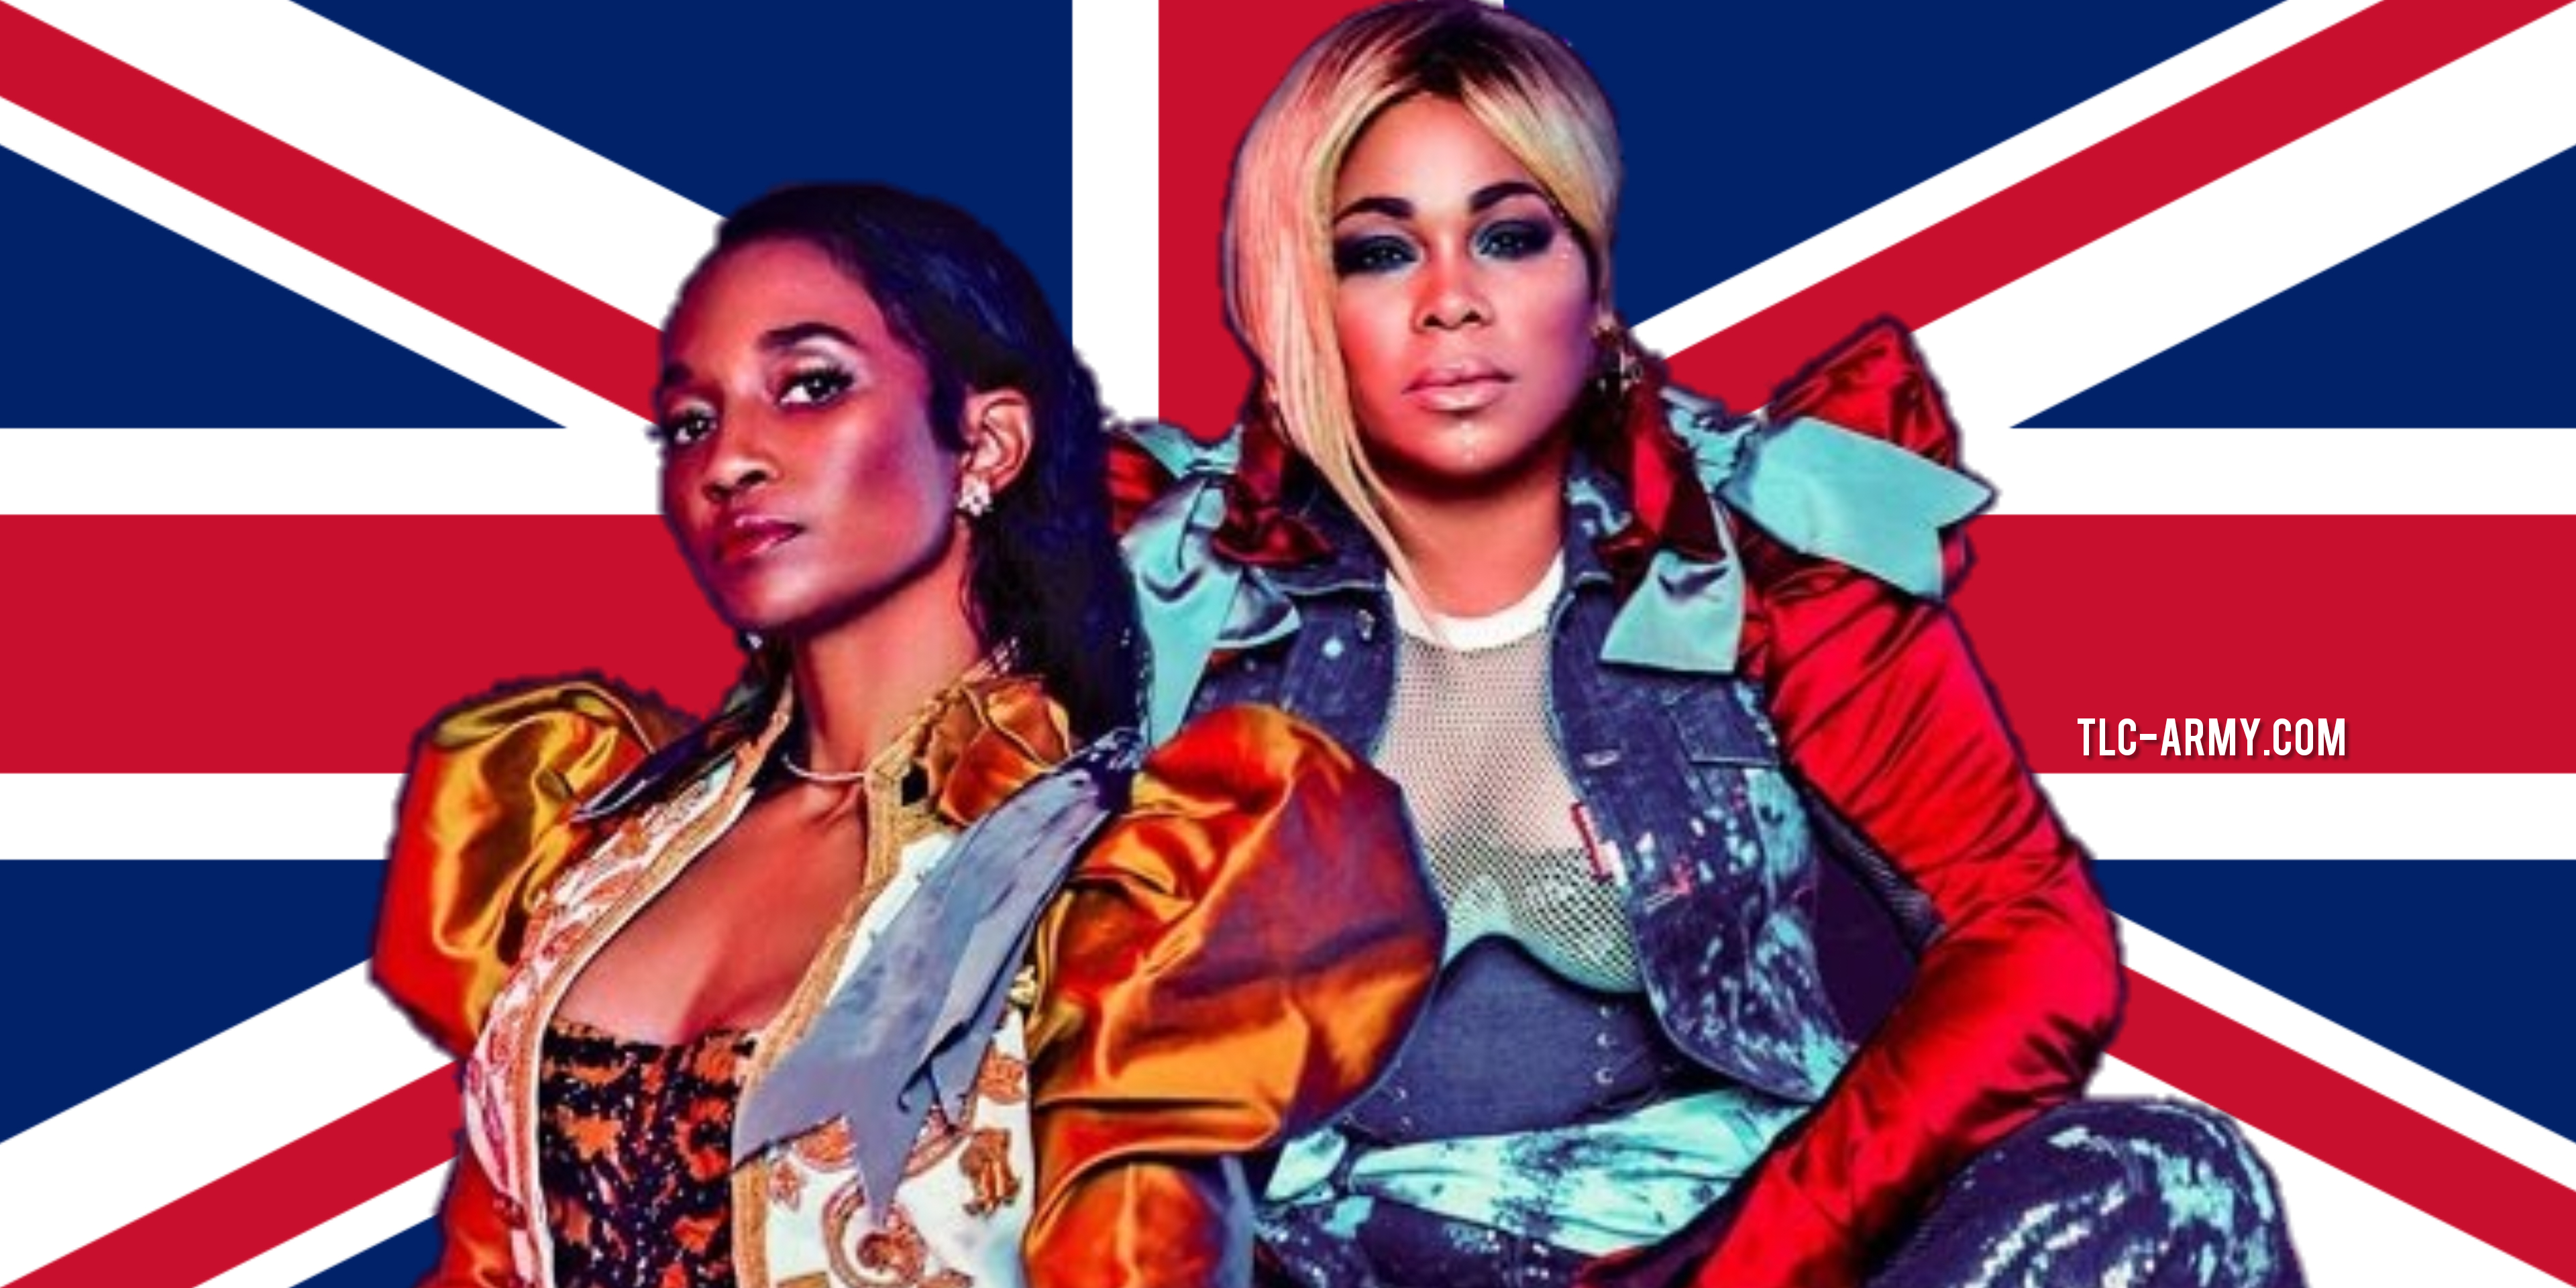 TLC Announce Return to UK on 'CrazySexyCool' 25th Anniversary, Tease Glastonbury Festival 2020